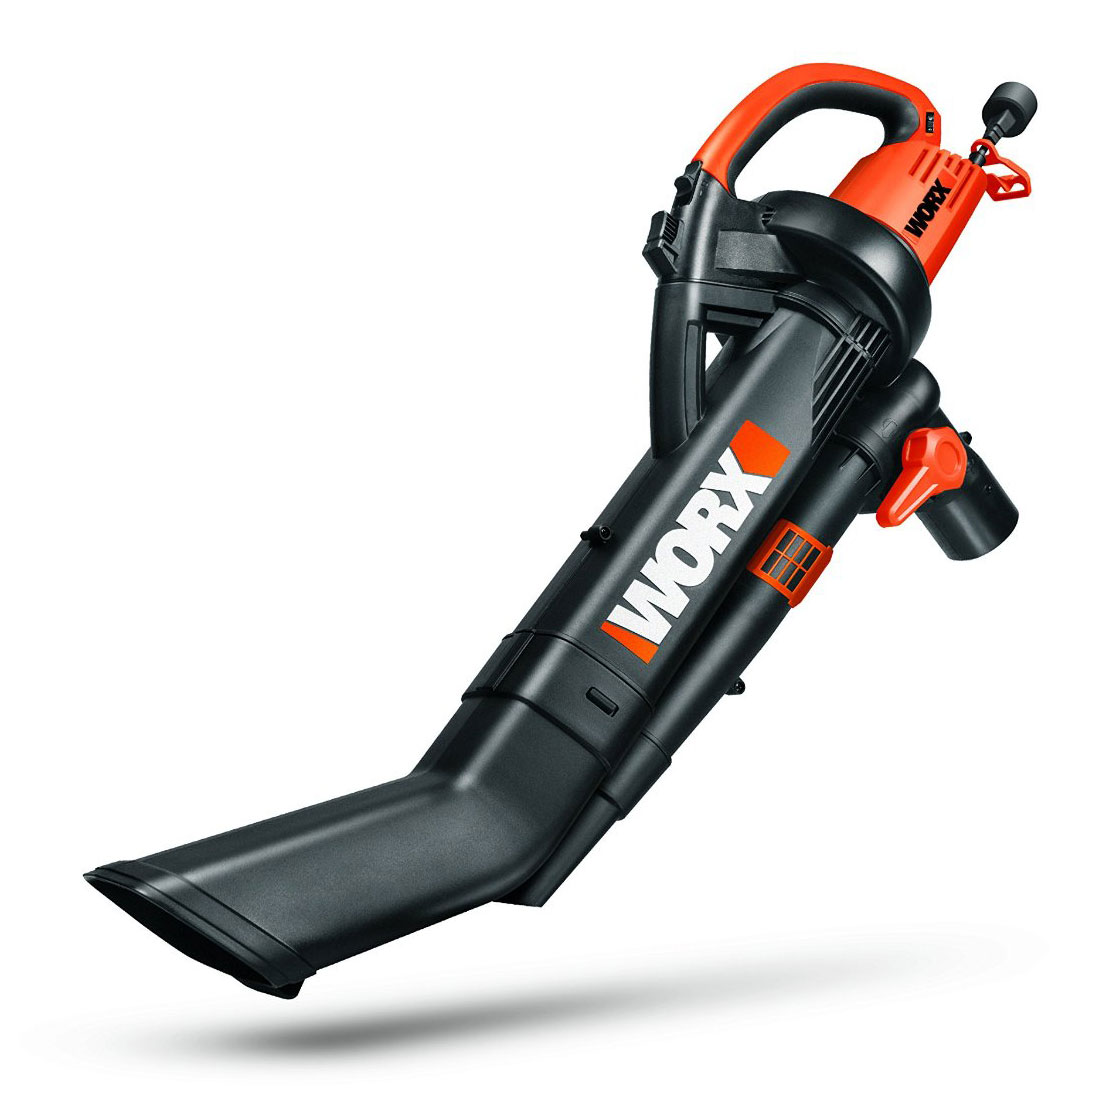 Cordless Leaf Blower Vacuum Mulcher Ryobi Cordless Vacuum